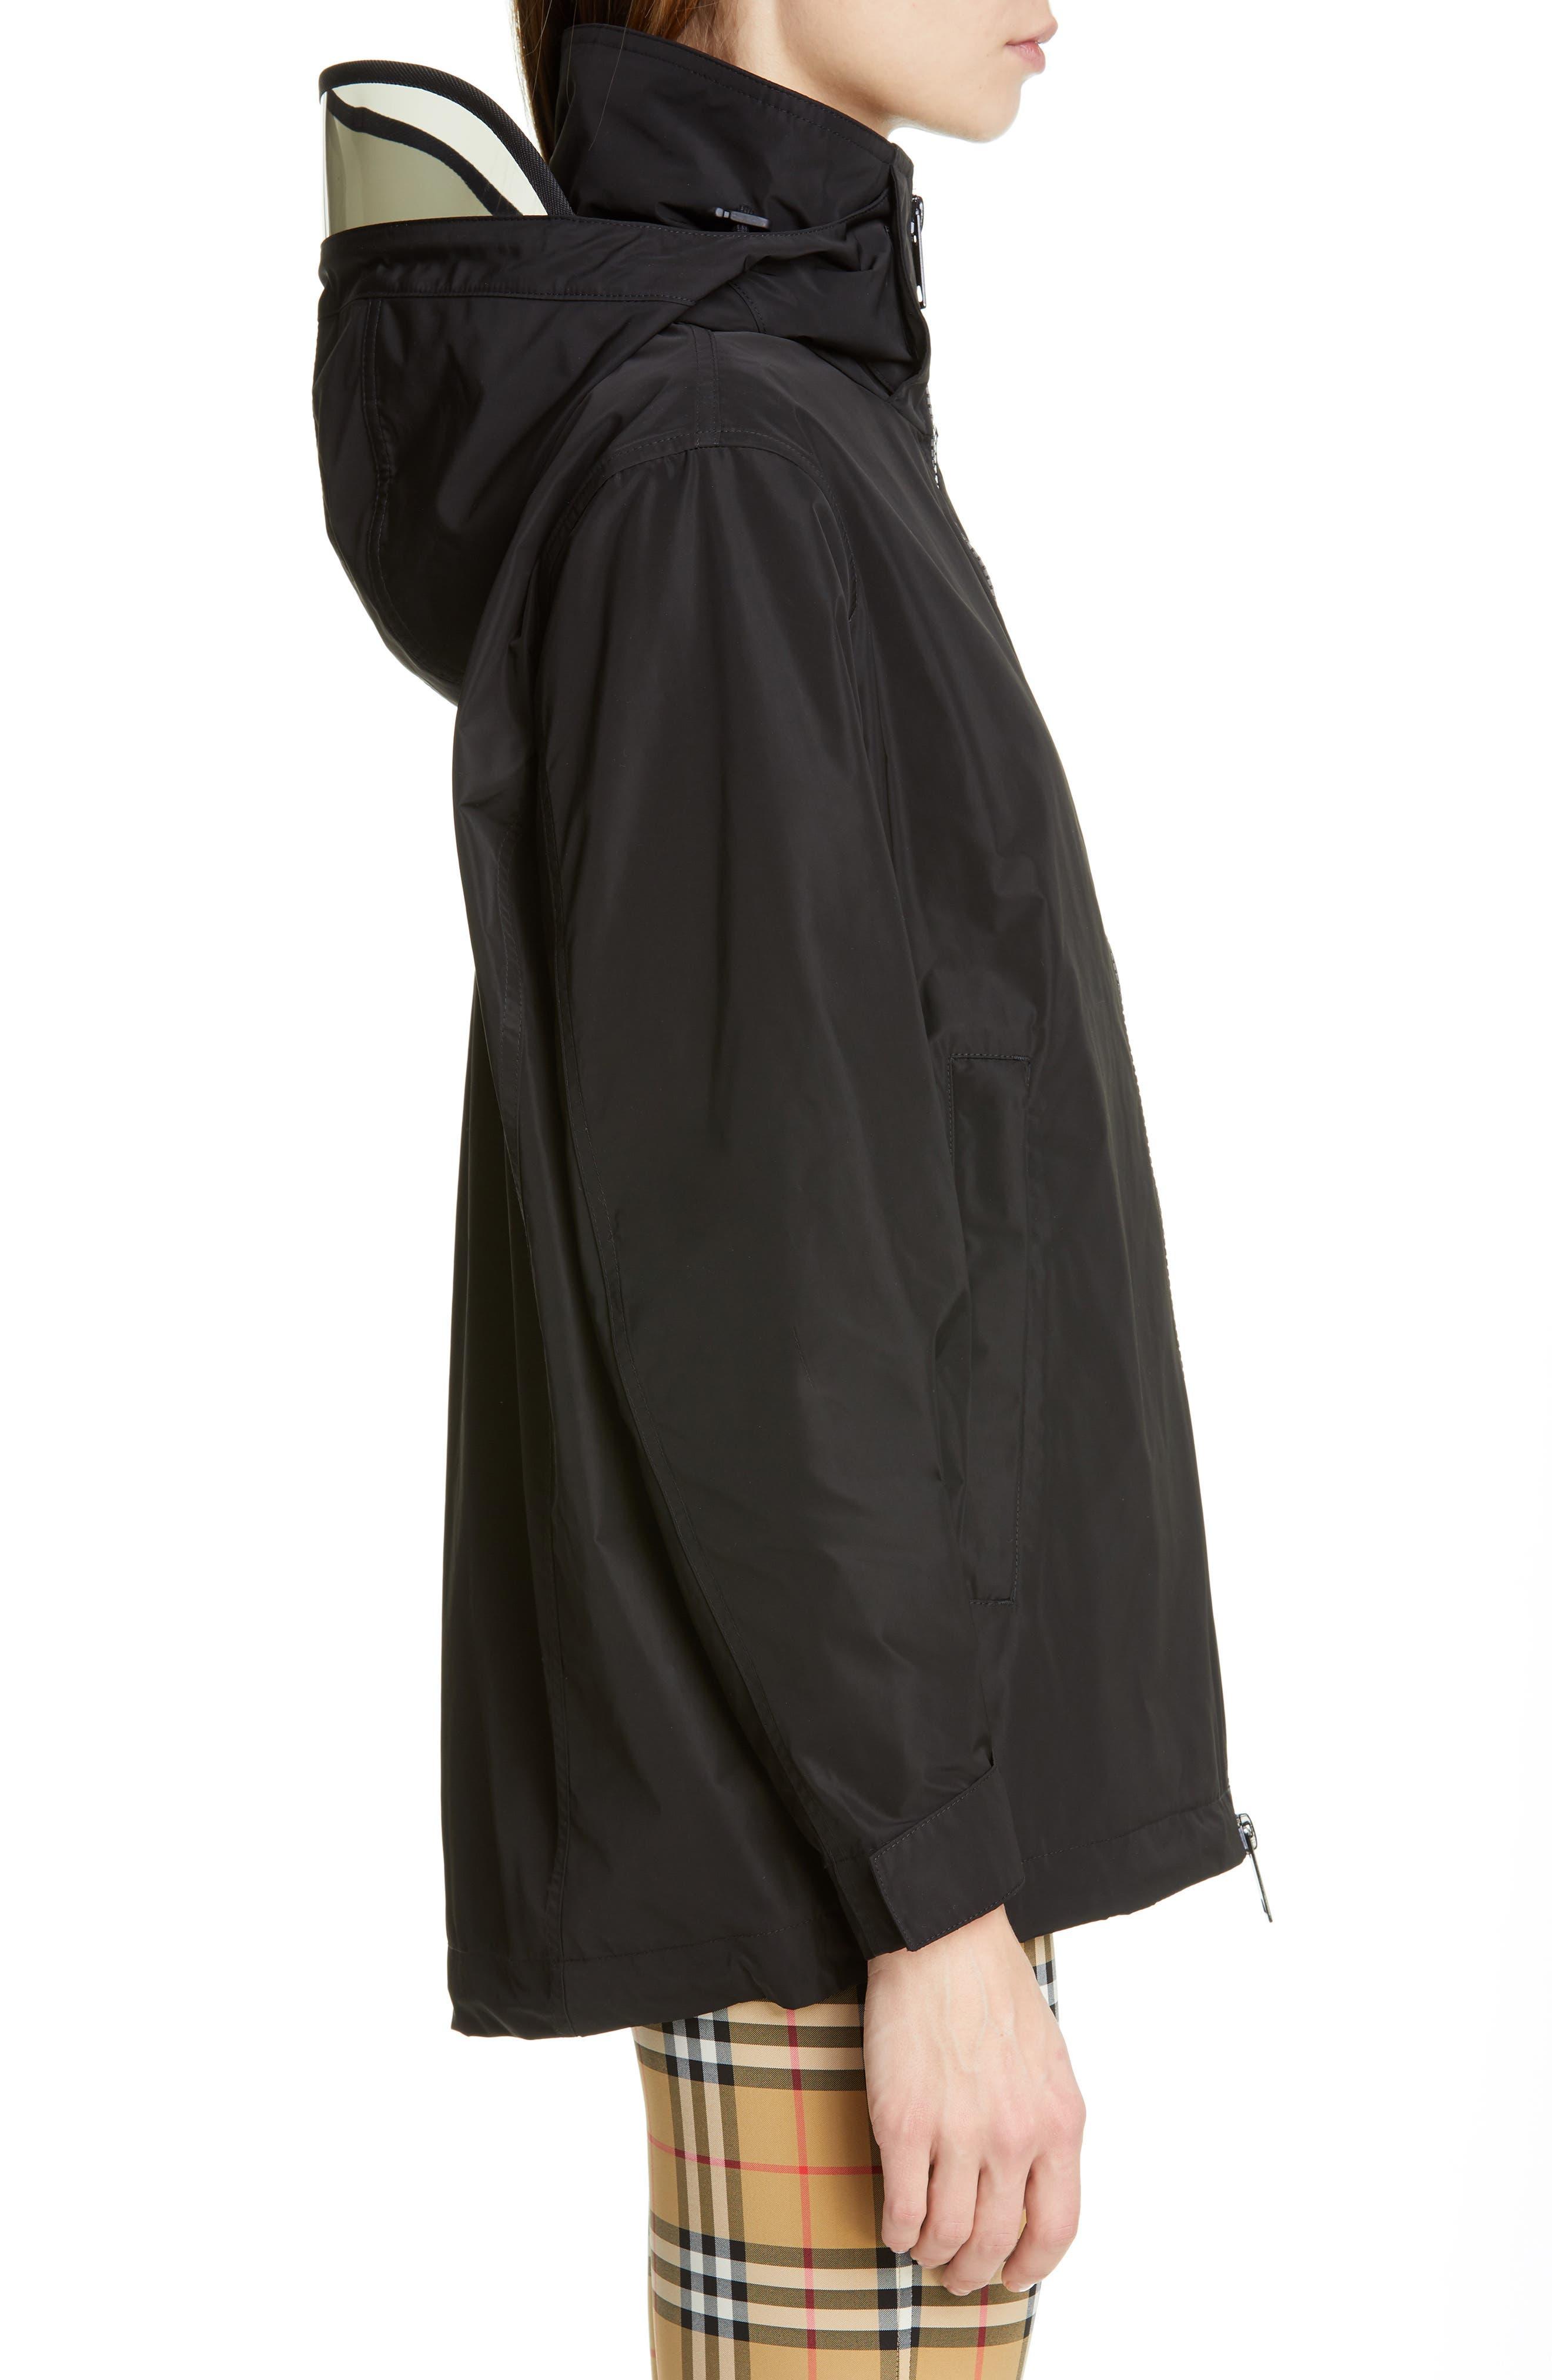 BURBERRY, Kway Millport Logo Print Waterproof Taffeta Jacket, Alternate thumbnail 4, color, BLACK